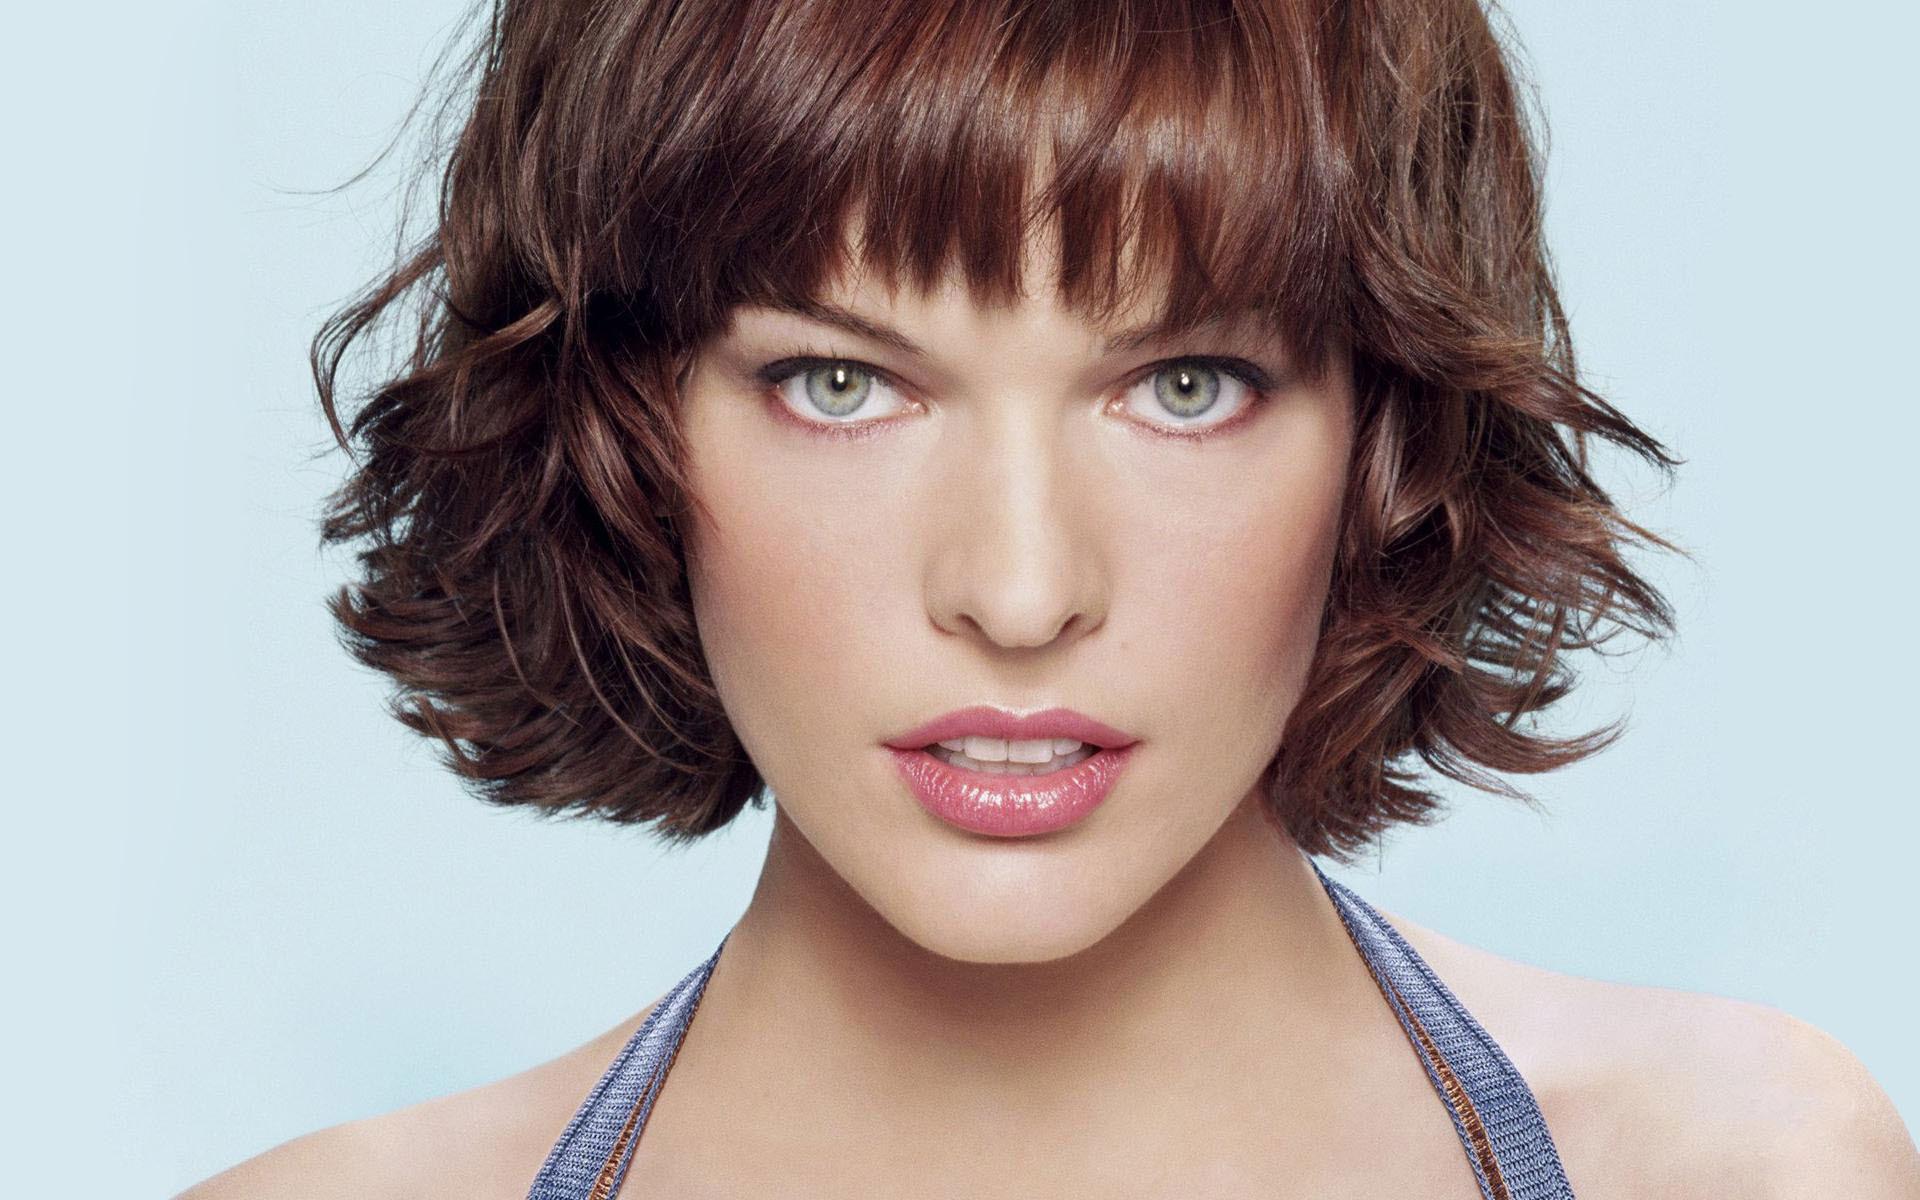 Milla Jovovich in  The Fifth Element